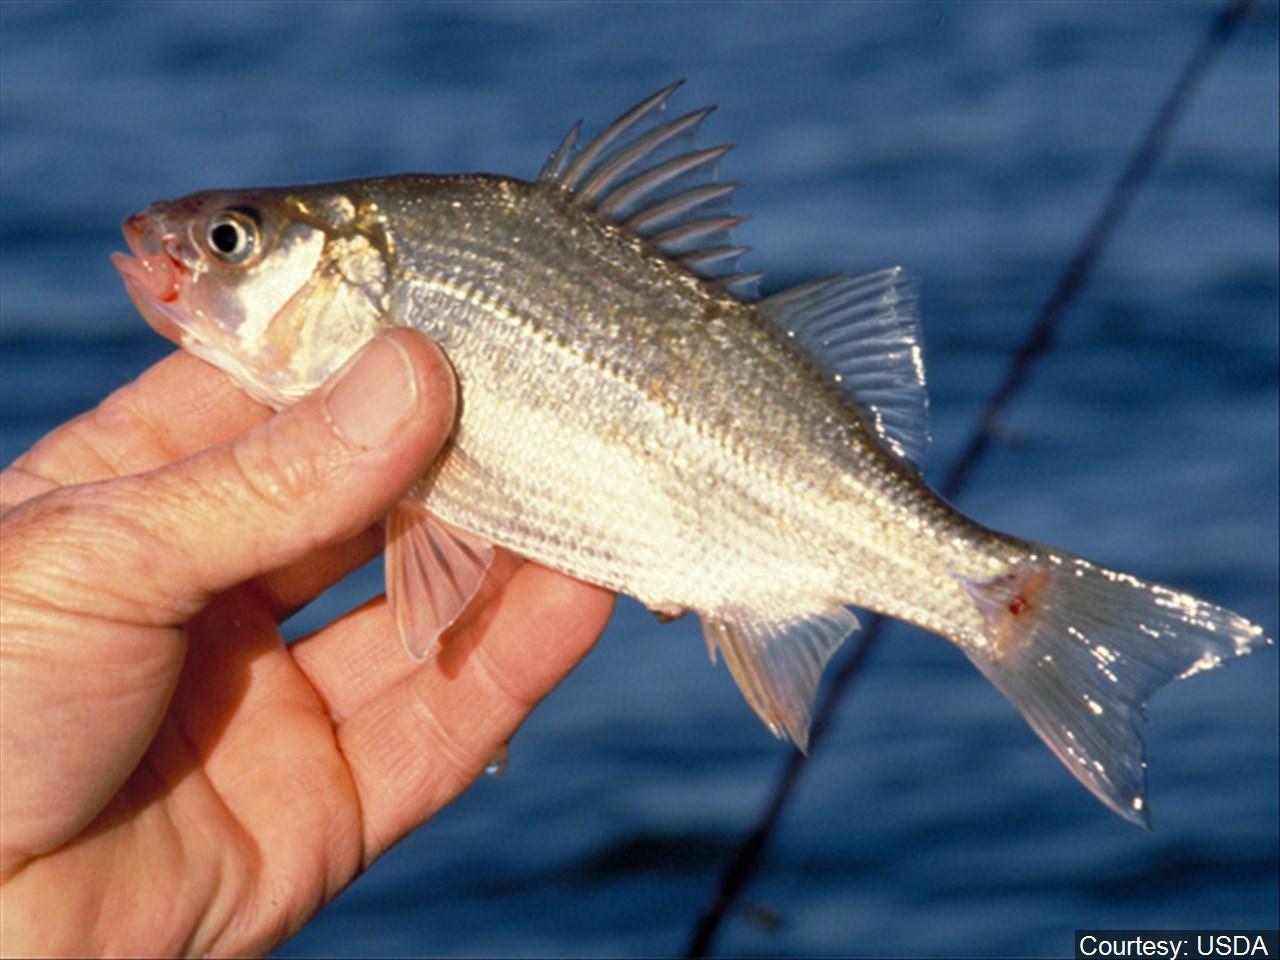 Fishing tournament benefiting veterans set for Saturday in La Quinta